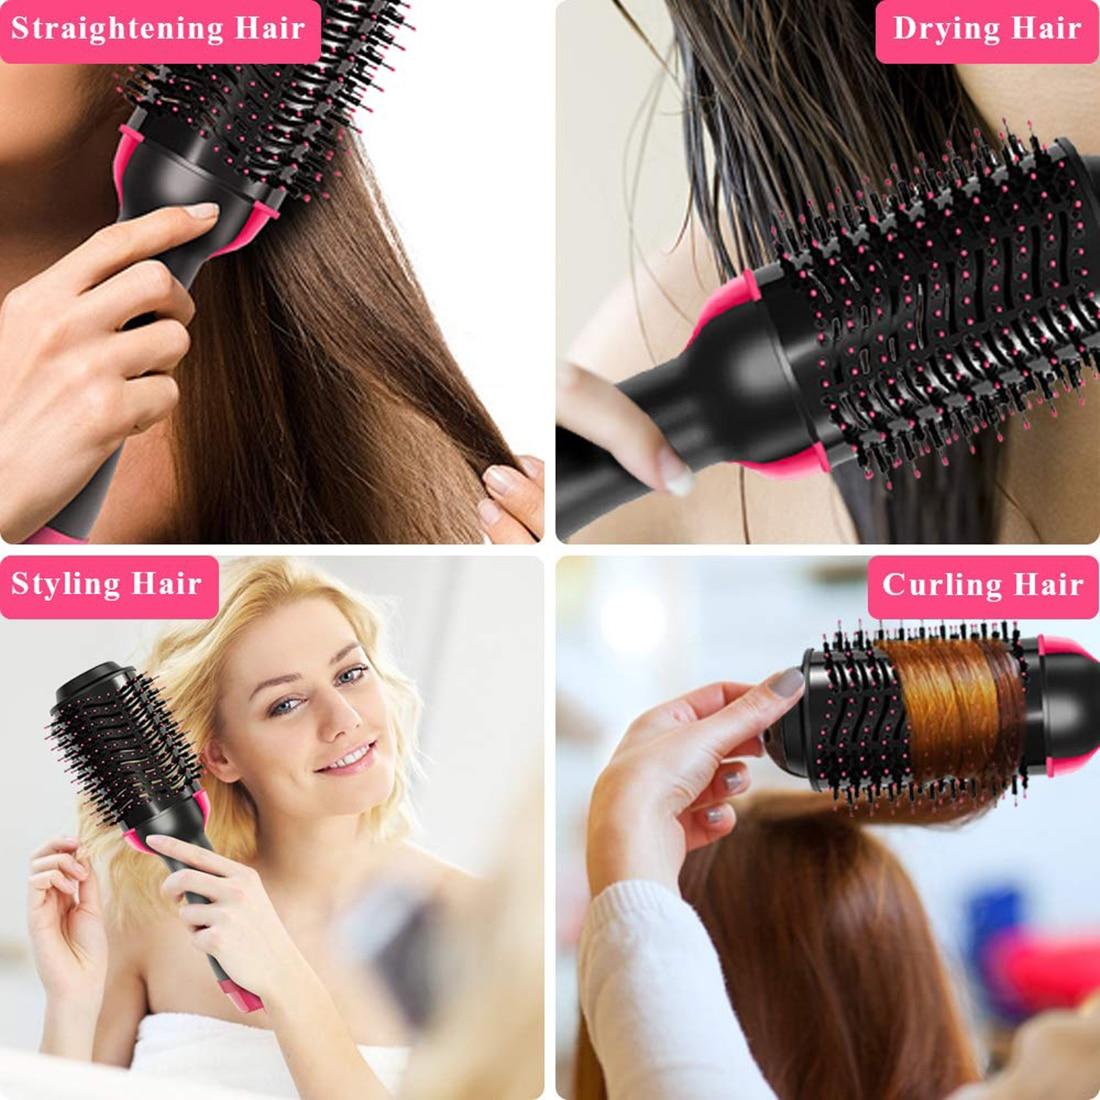 Professional Hair Dryer Volumizer Hot Air Dryer Machine Hair Blower Blowdryer Salon Equipment Comb Portable Hair Dryer Brush enlarge